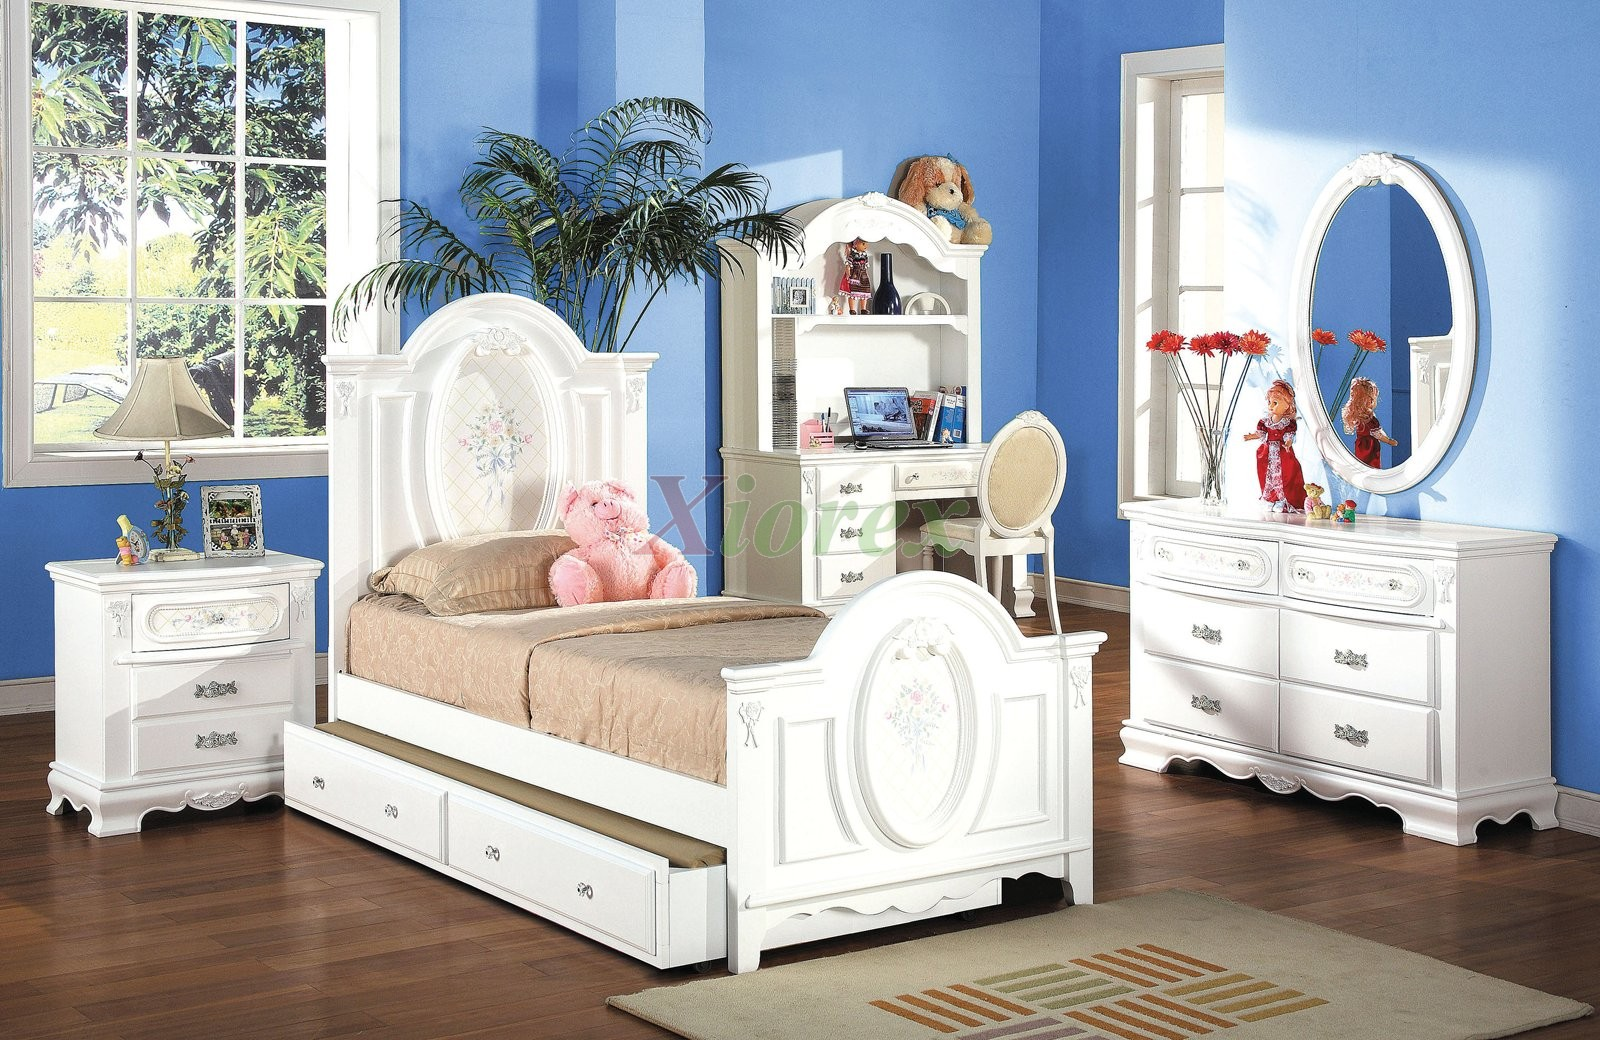 kids bedroom furniture sets kids bedroom furniture set with trundle bed and hutch 174   xiorex GDSDOIF